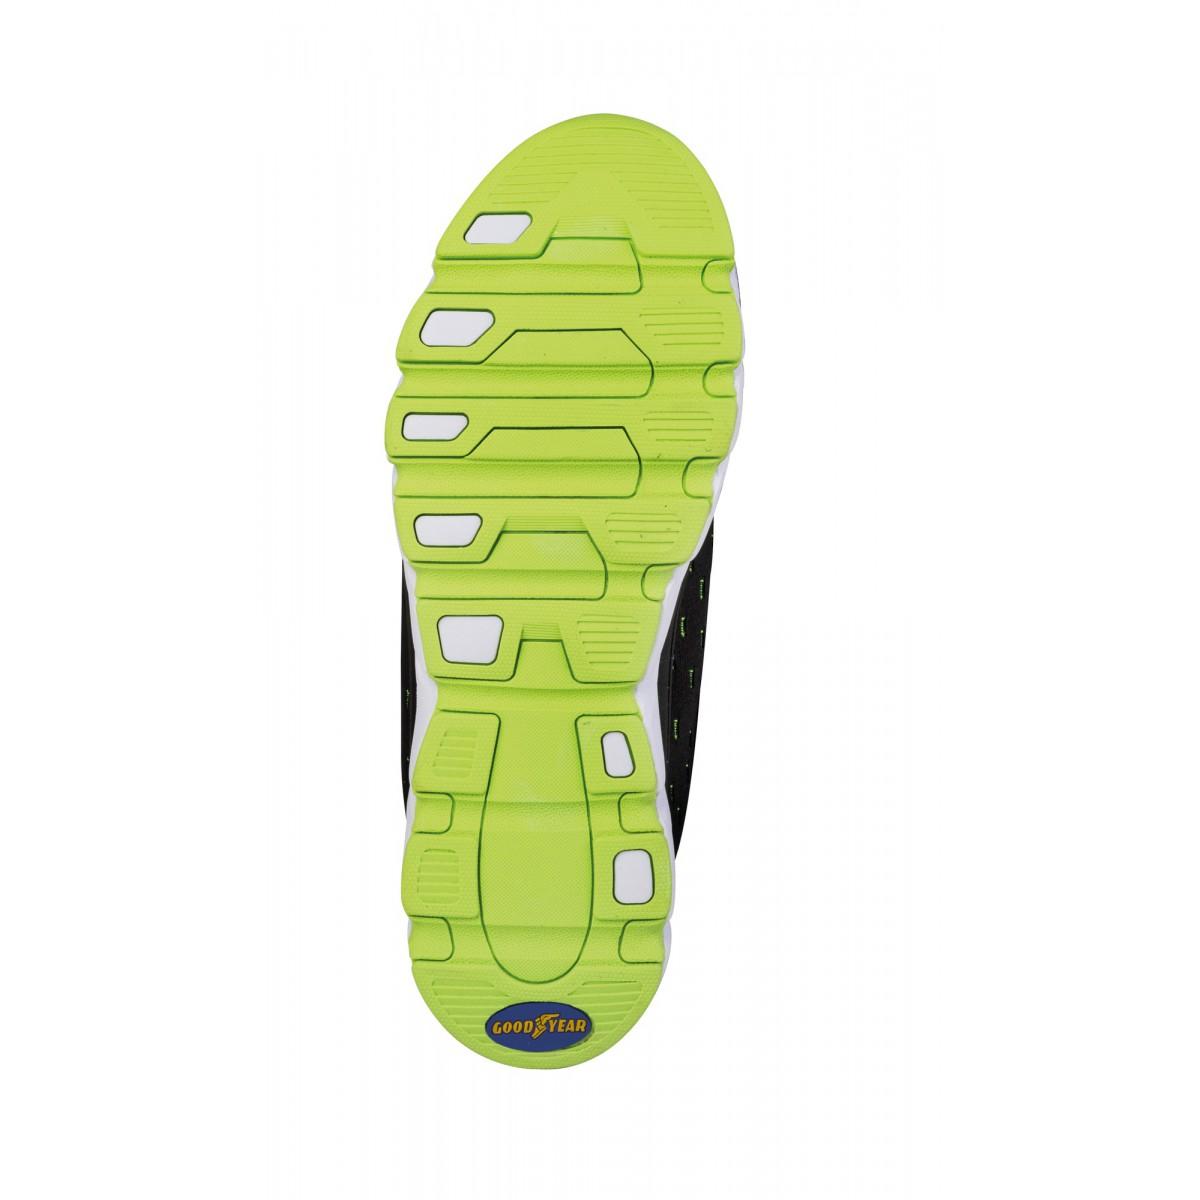 Chaussures basses de sécurité type Running PHOENIX T41